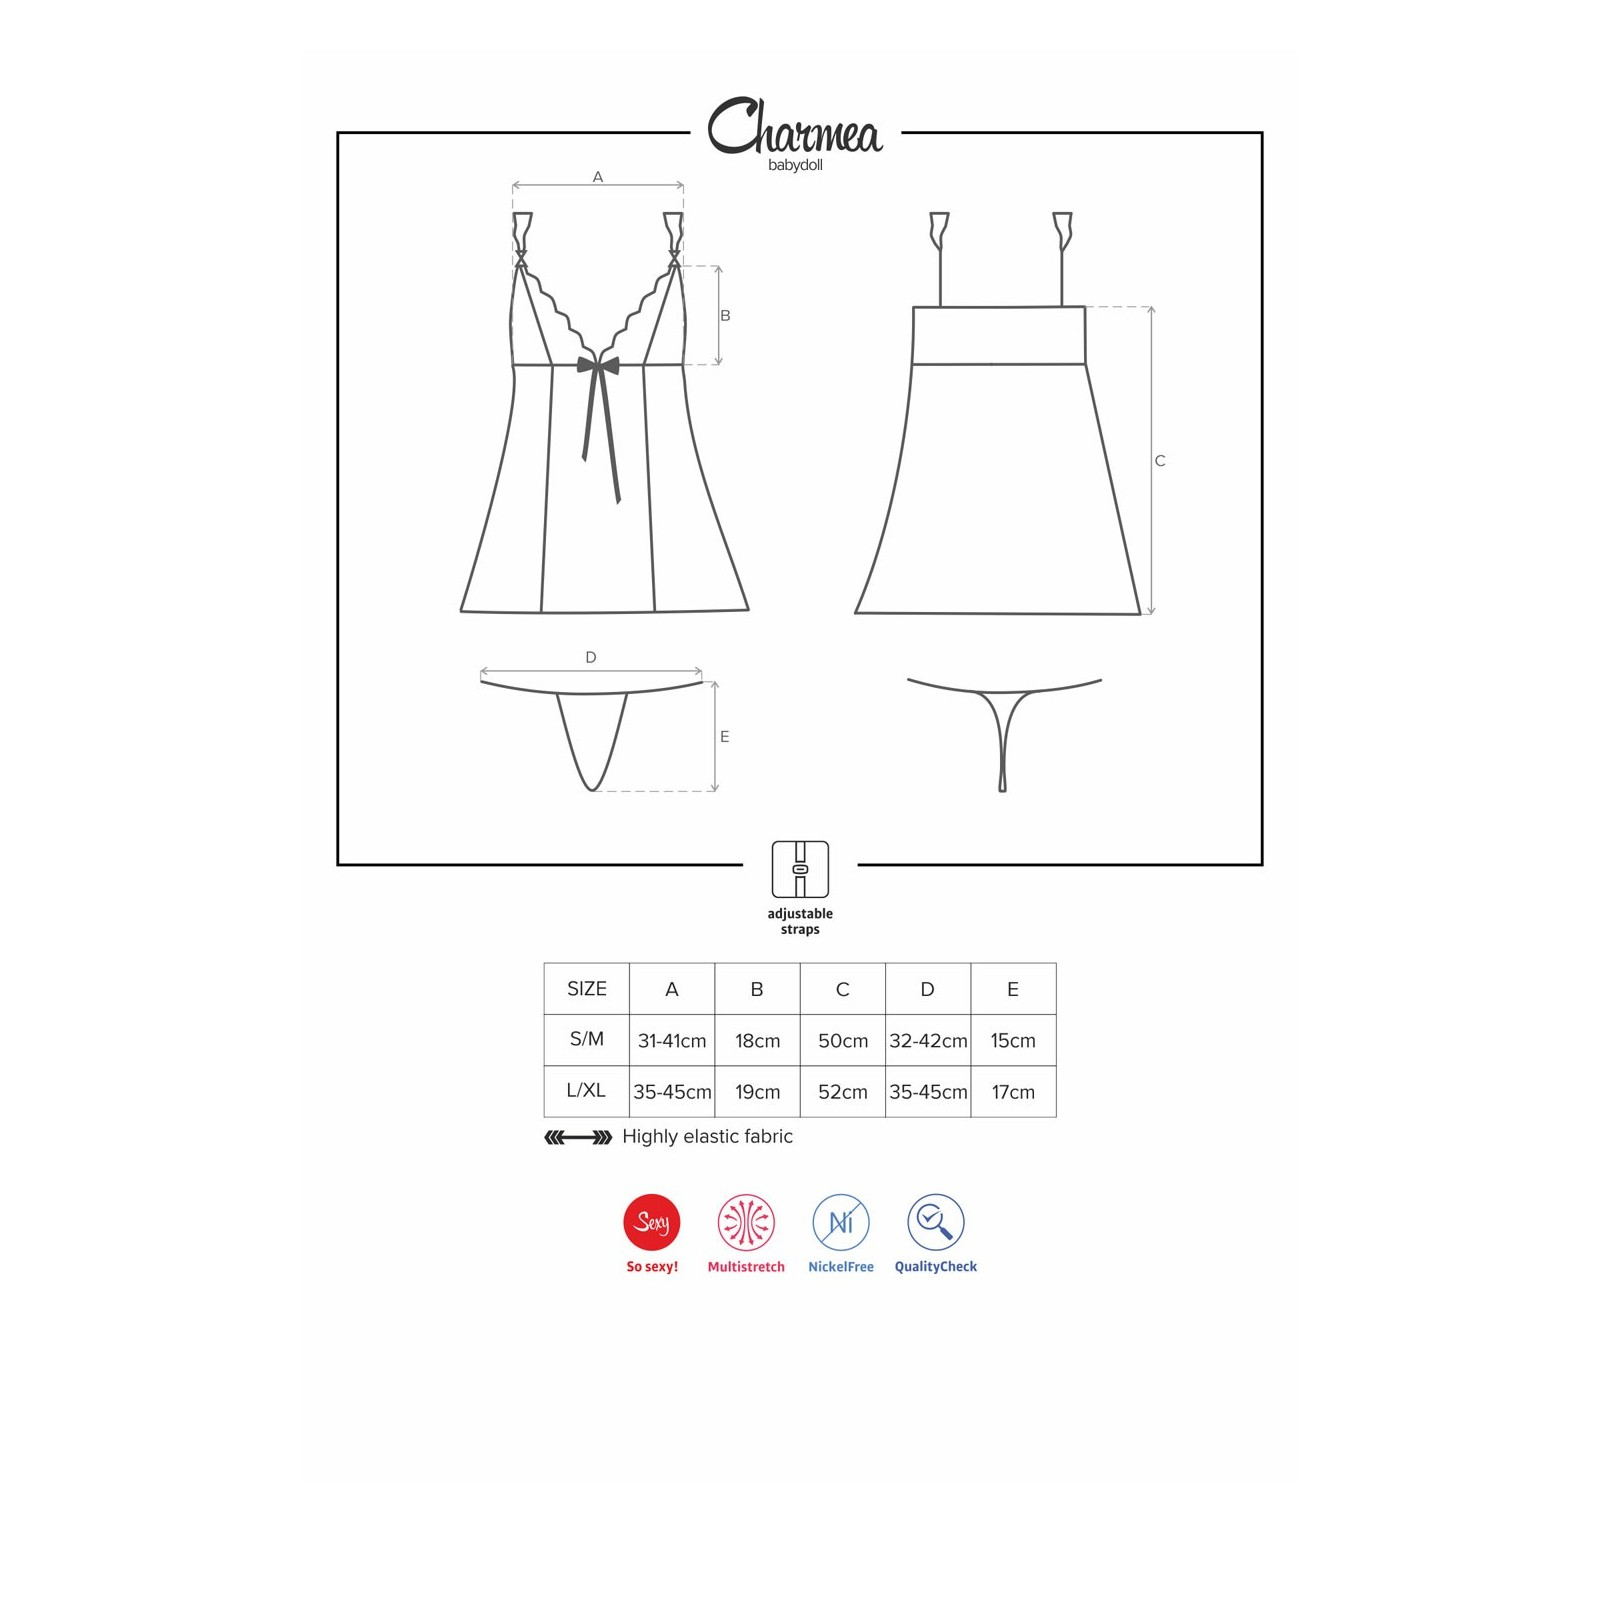 Charmea Babydoll - 7 - Vorschaubild